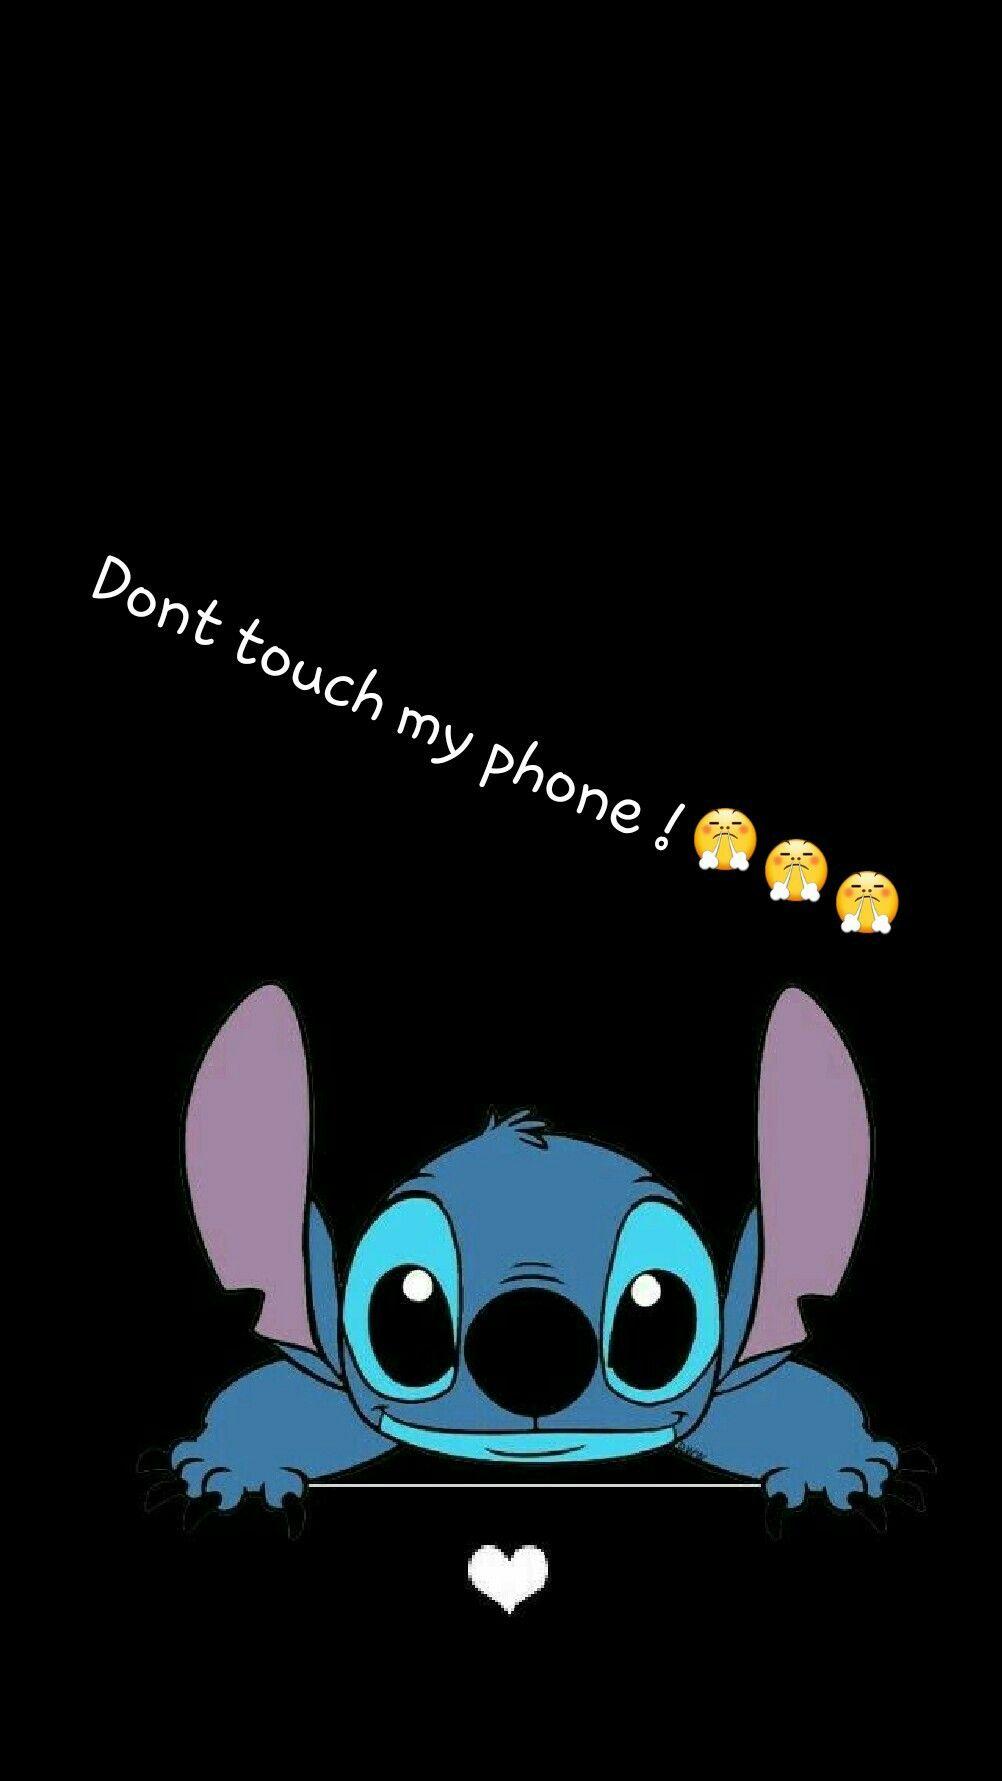 Fond Ecran Fond D Ecran Iphone Mignon Fond D Ecran Dessin Anime Fond D Ecran Stitch